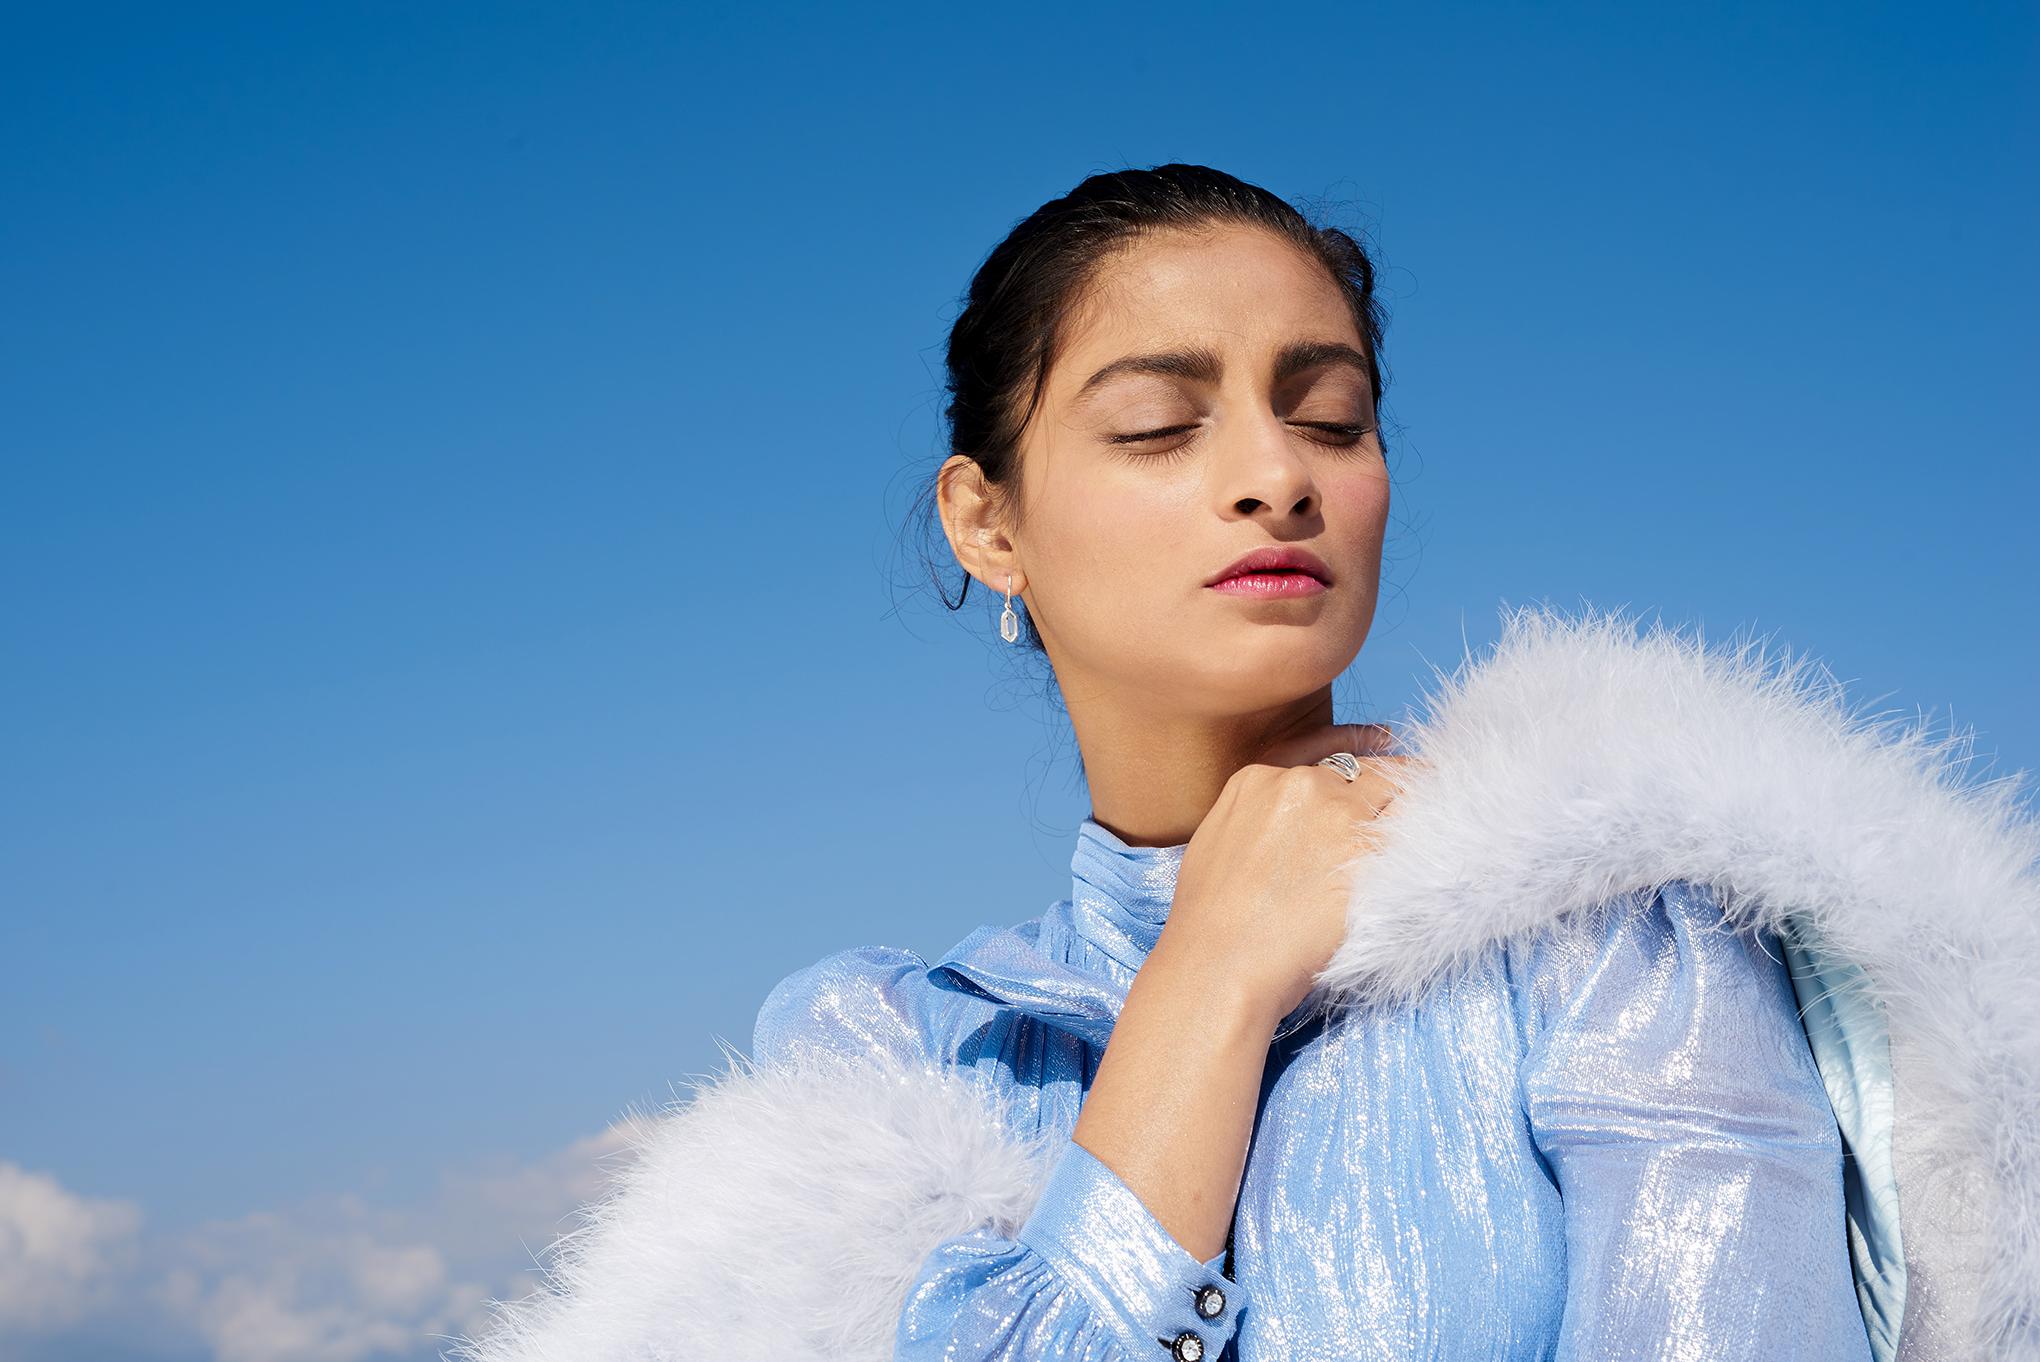 Categories: Fashion, Weddings-Zoe & Morgan - You are the Sky 2018